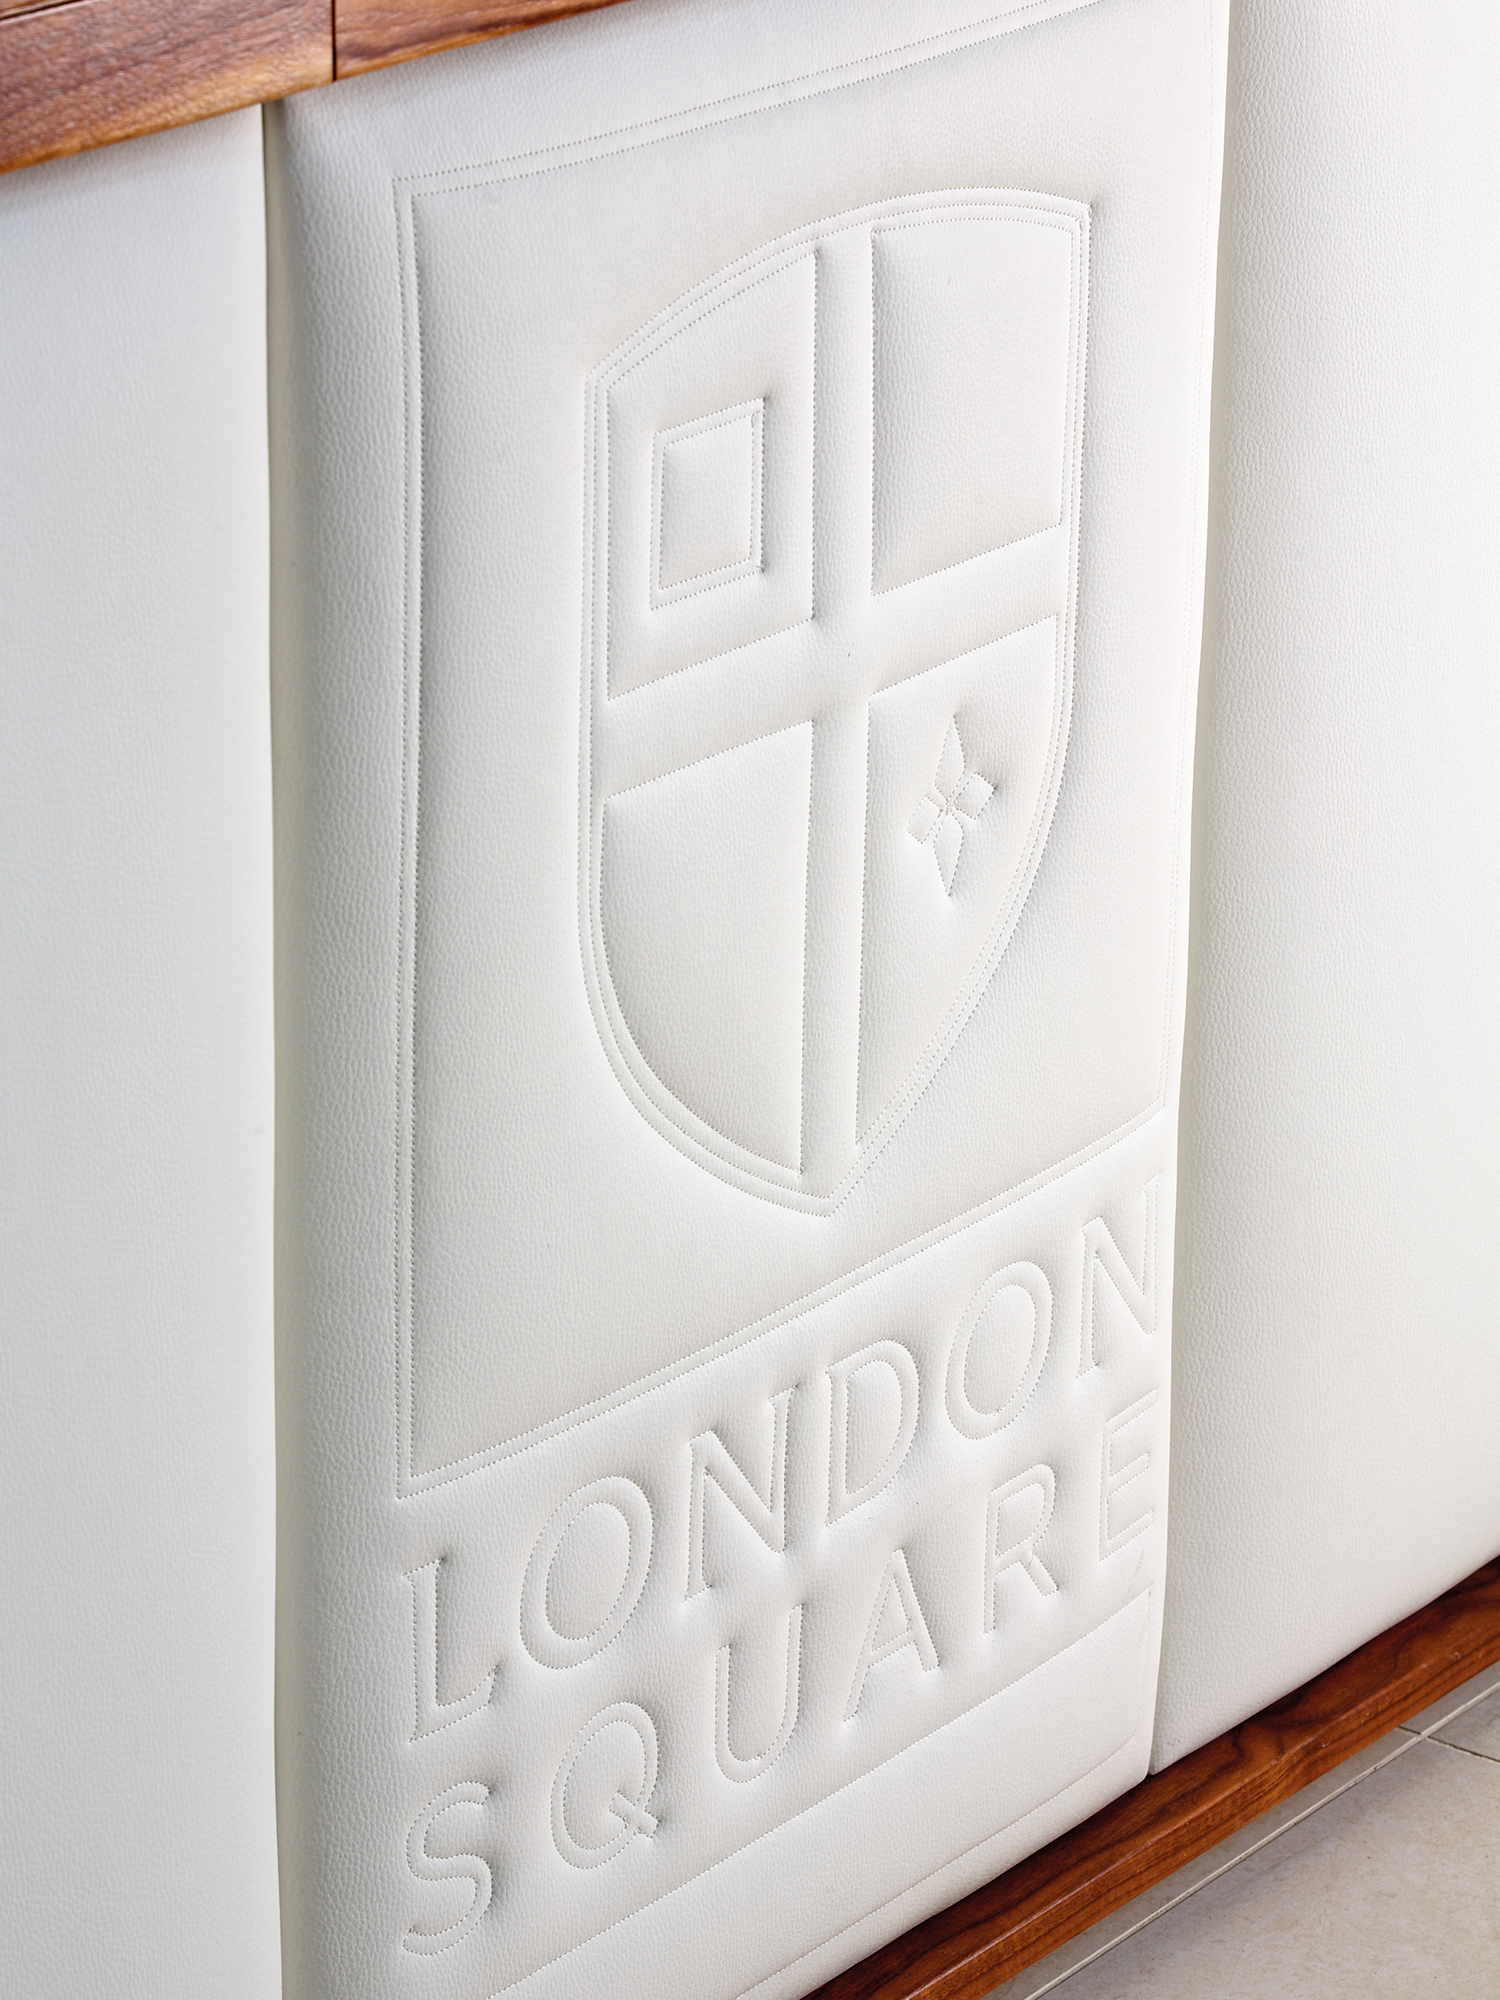 004-LS-Fulham-MS-005.jpg